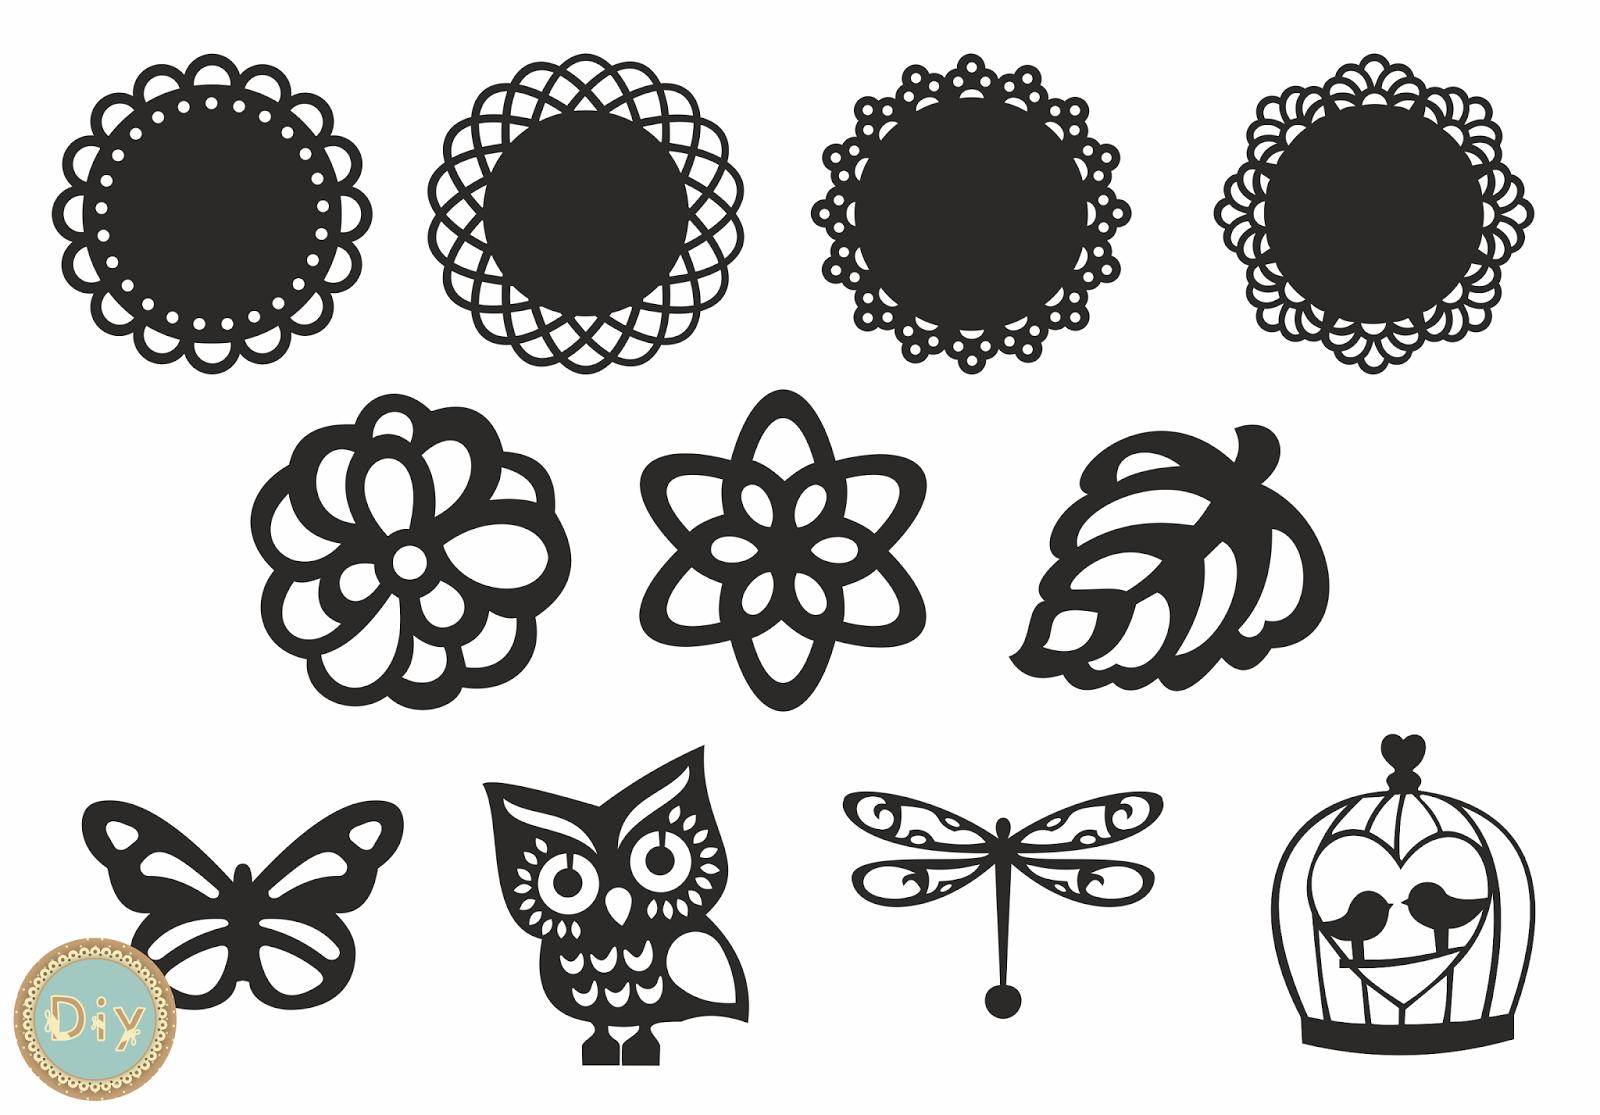 plantillas para silhouette cameo gratis - Google Search | Cameo ...